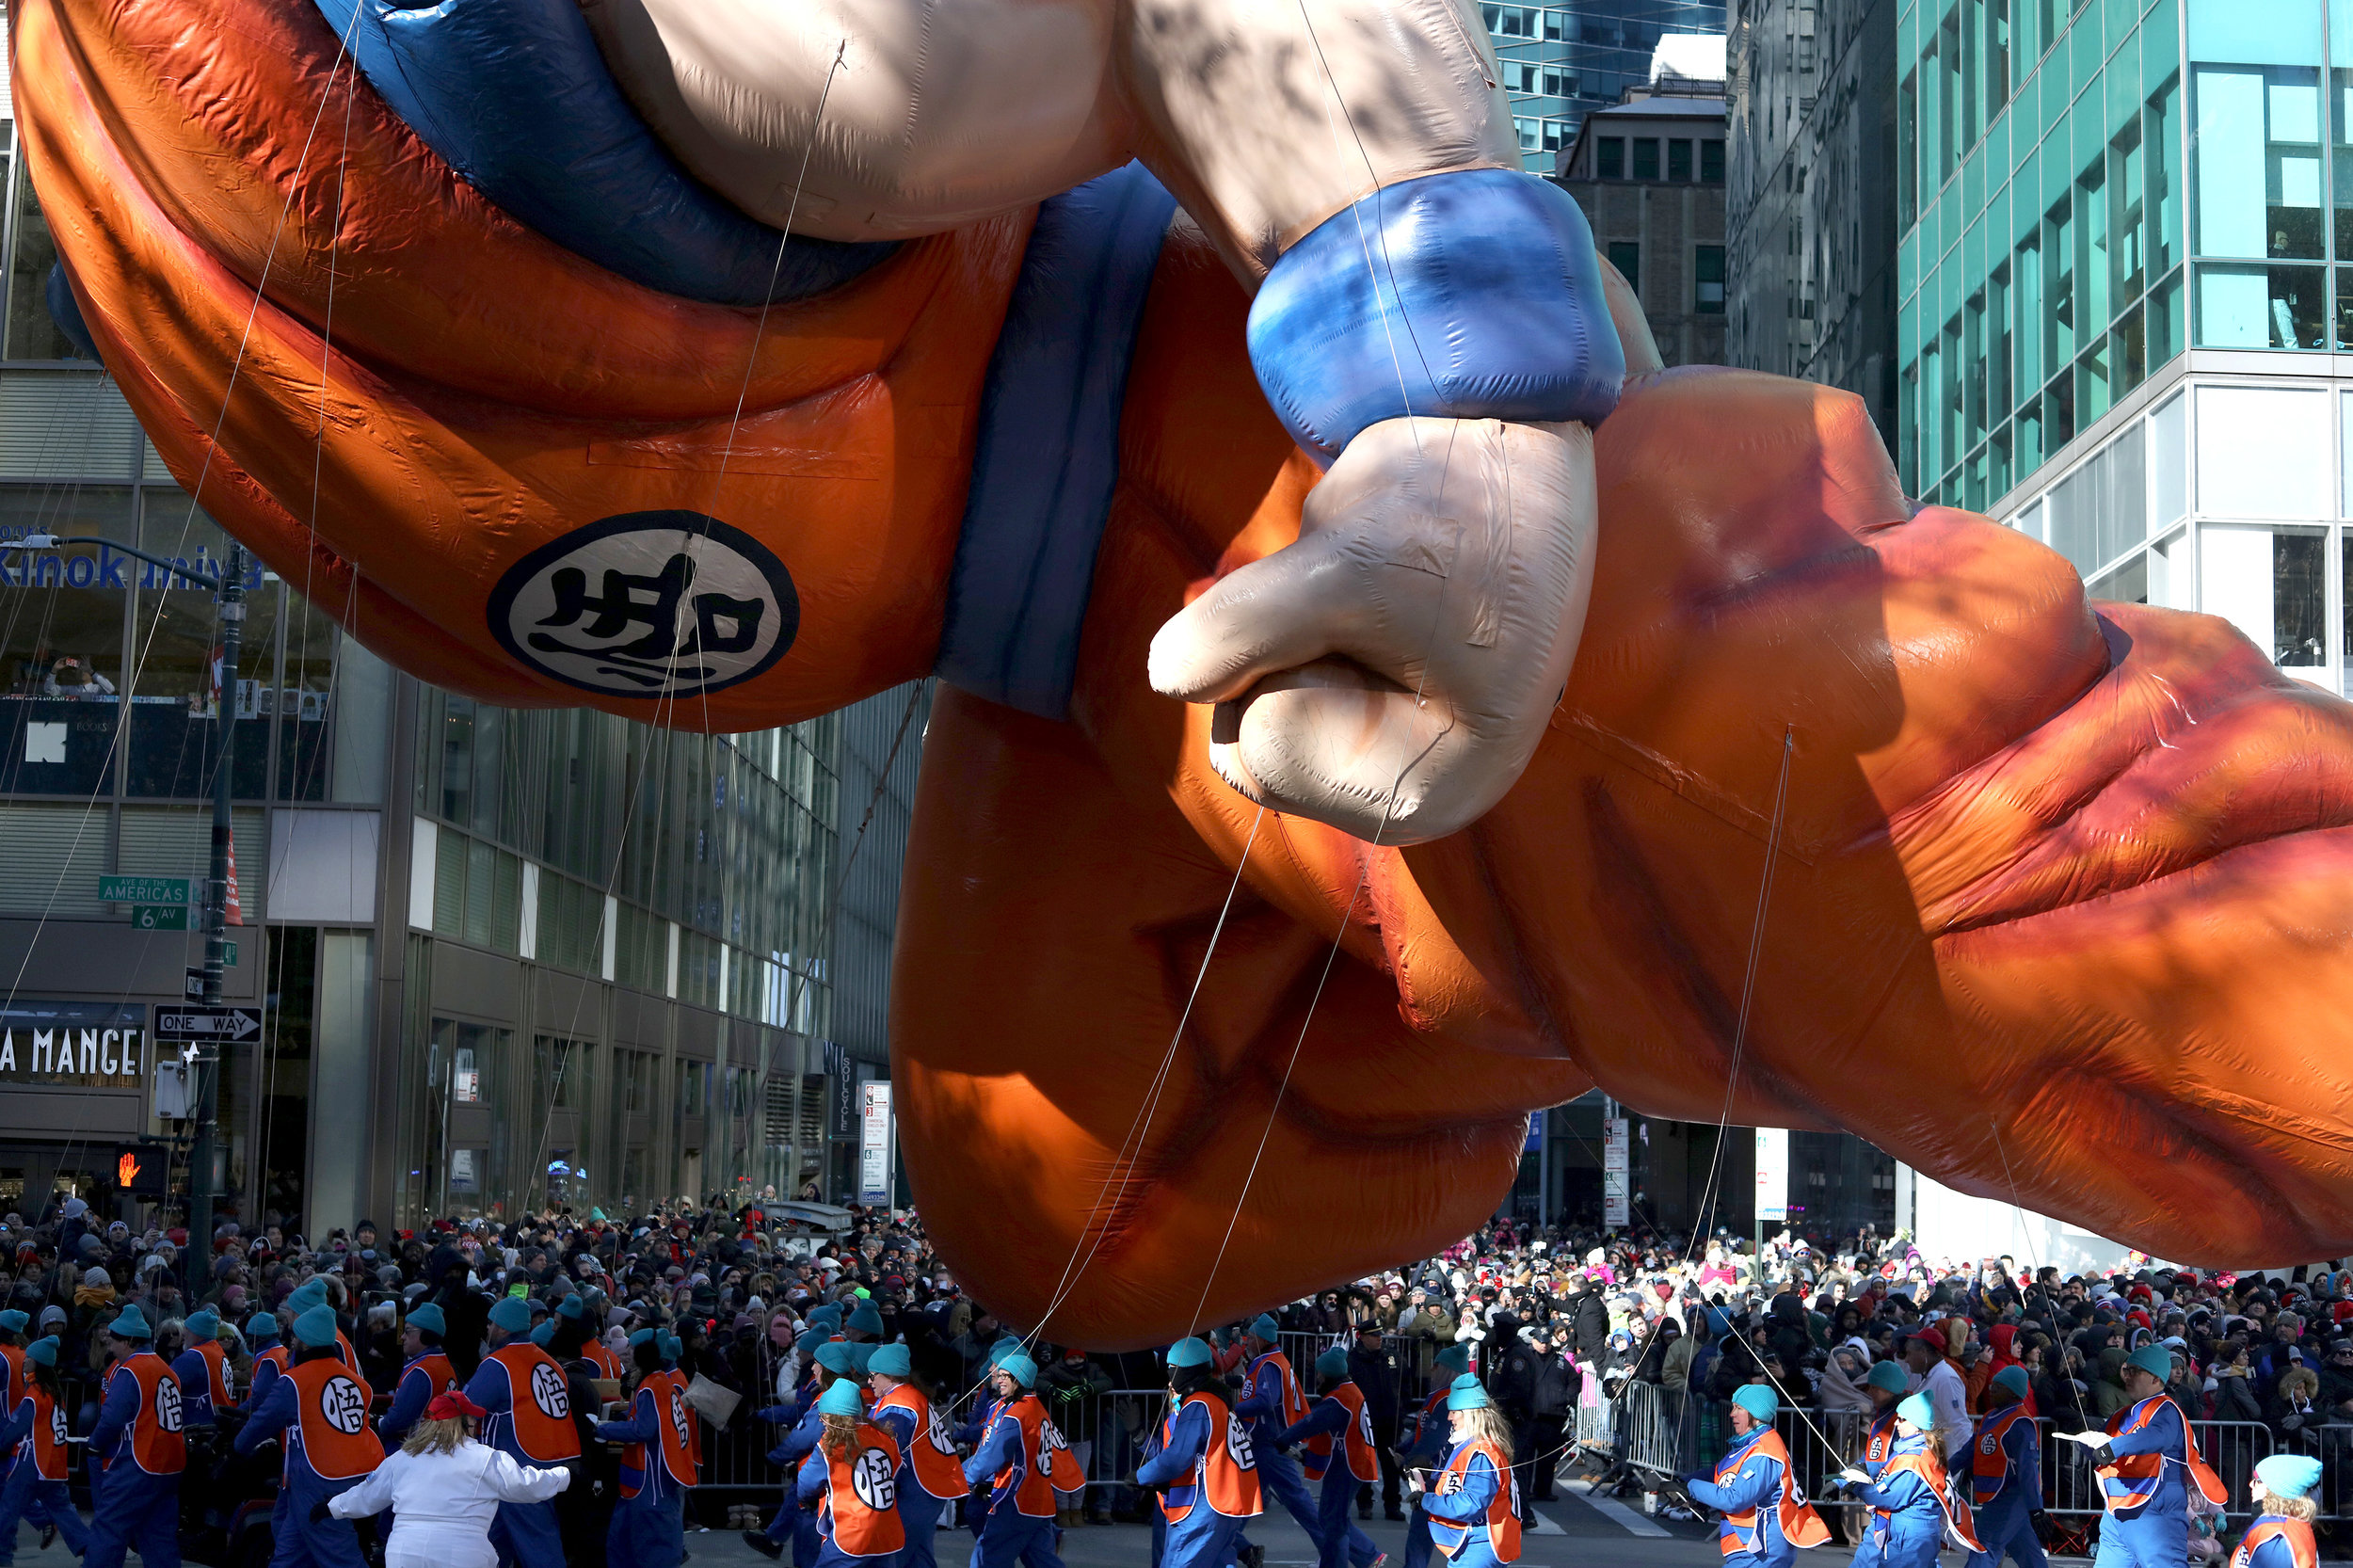 Dragon Ball Z, Macy's Parade